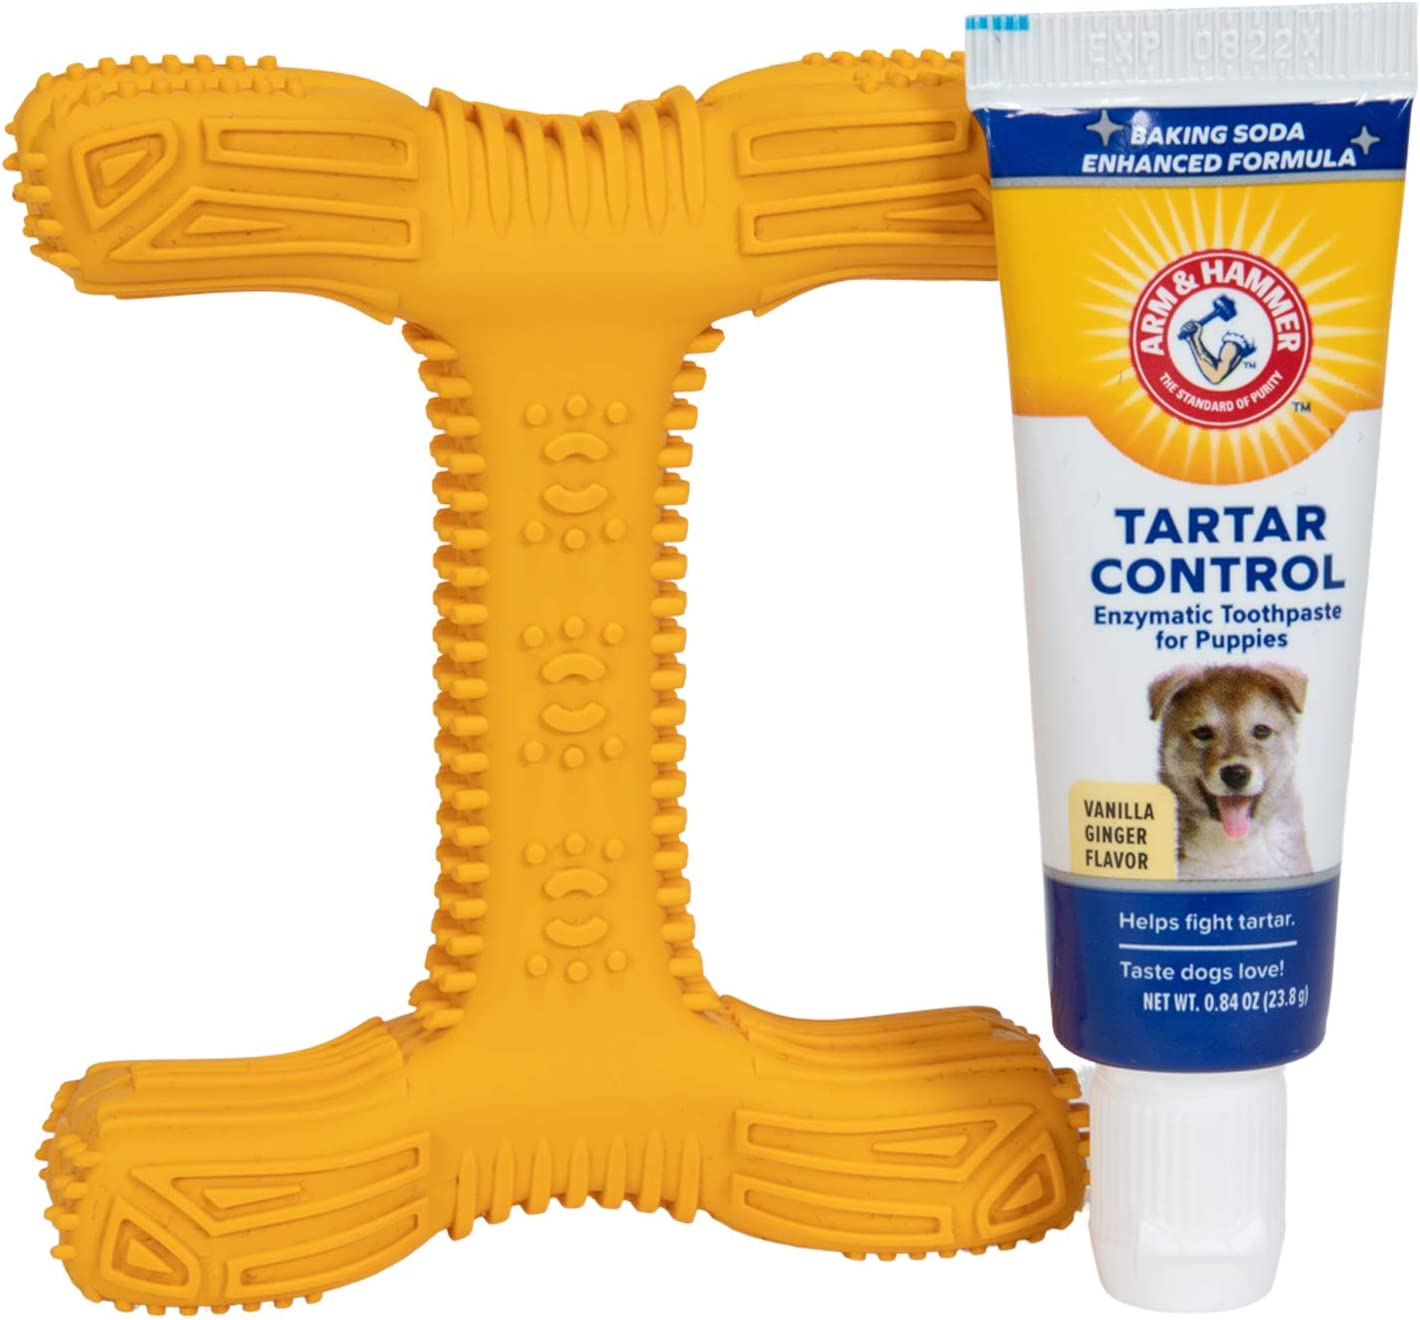 Arm & Hammer Dog Dental Care Tartar Control Kit for Dogs   Dog Dental Care Kit With Dog Toothbrush, Dog Fingerbrush, & Dog Toothpaste in Beef Flavor   With Enzymatic Dog Toothpaste to Fight Tartar